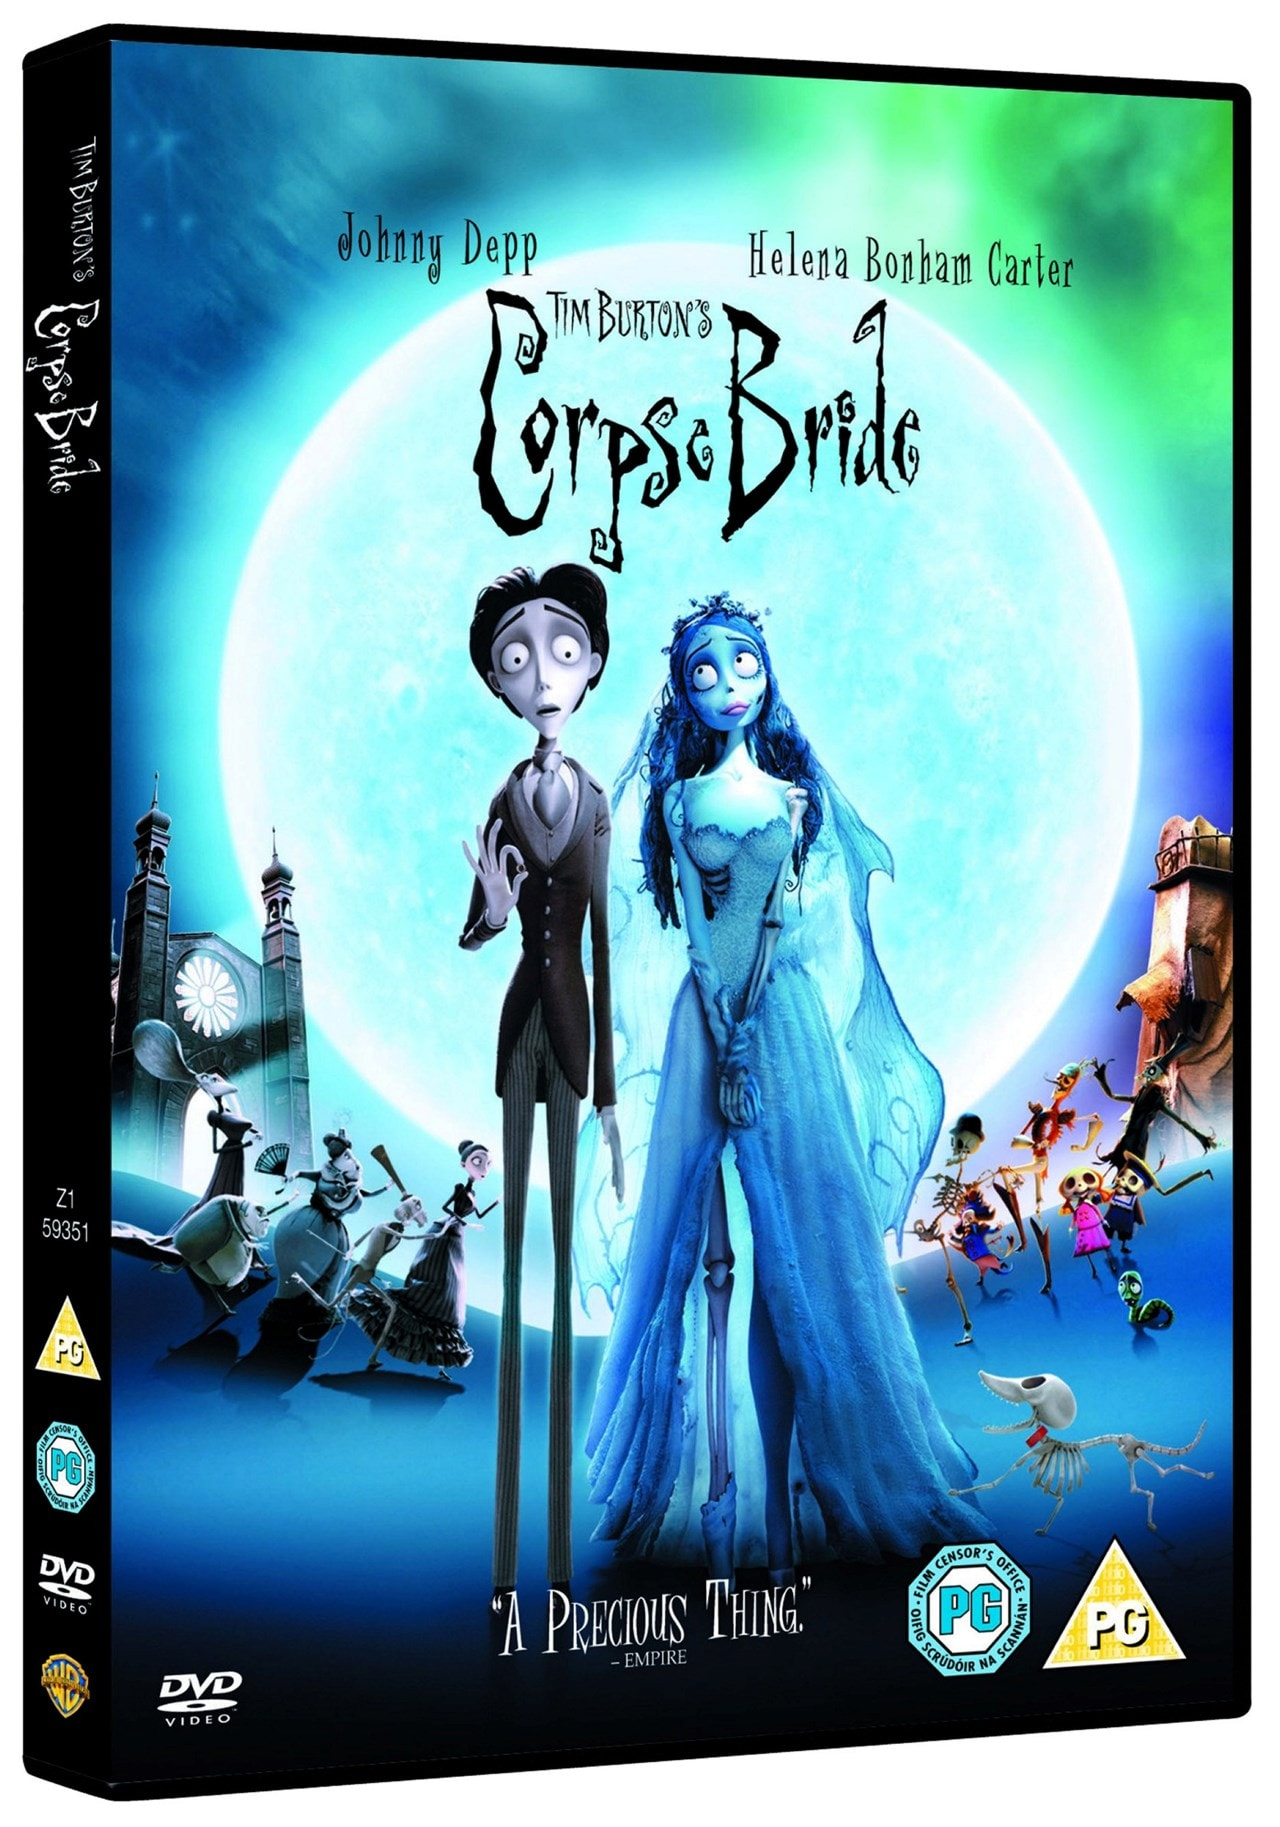 Tim Burton's Corpse Bride - 2